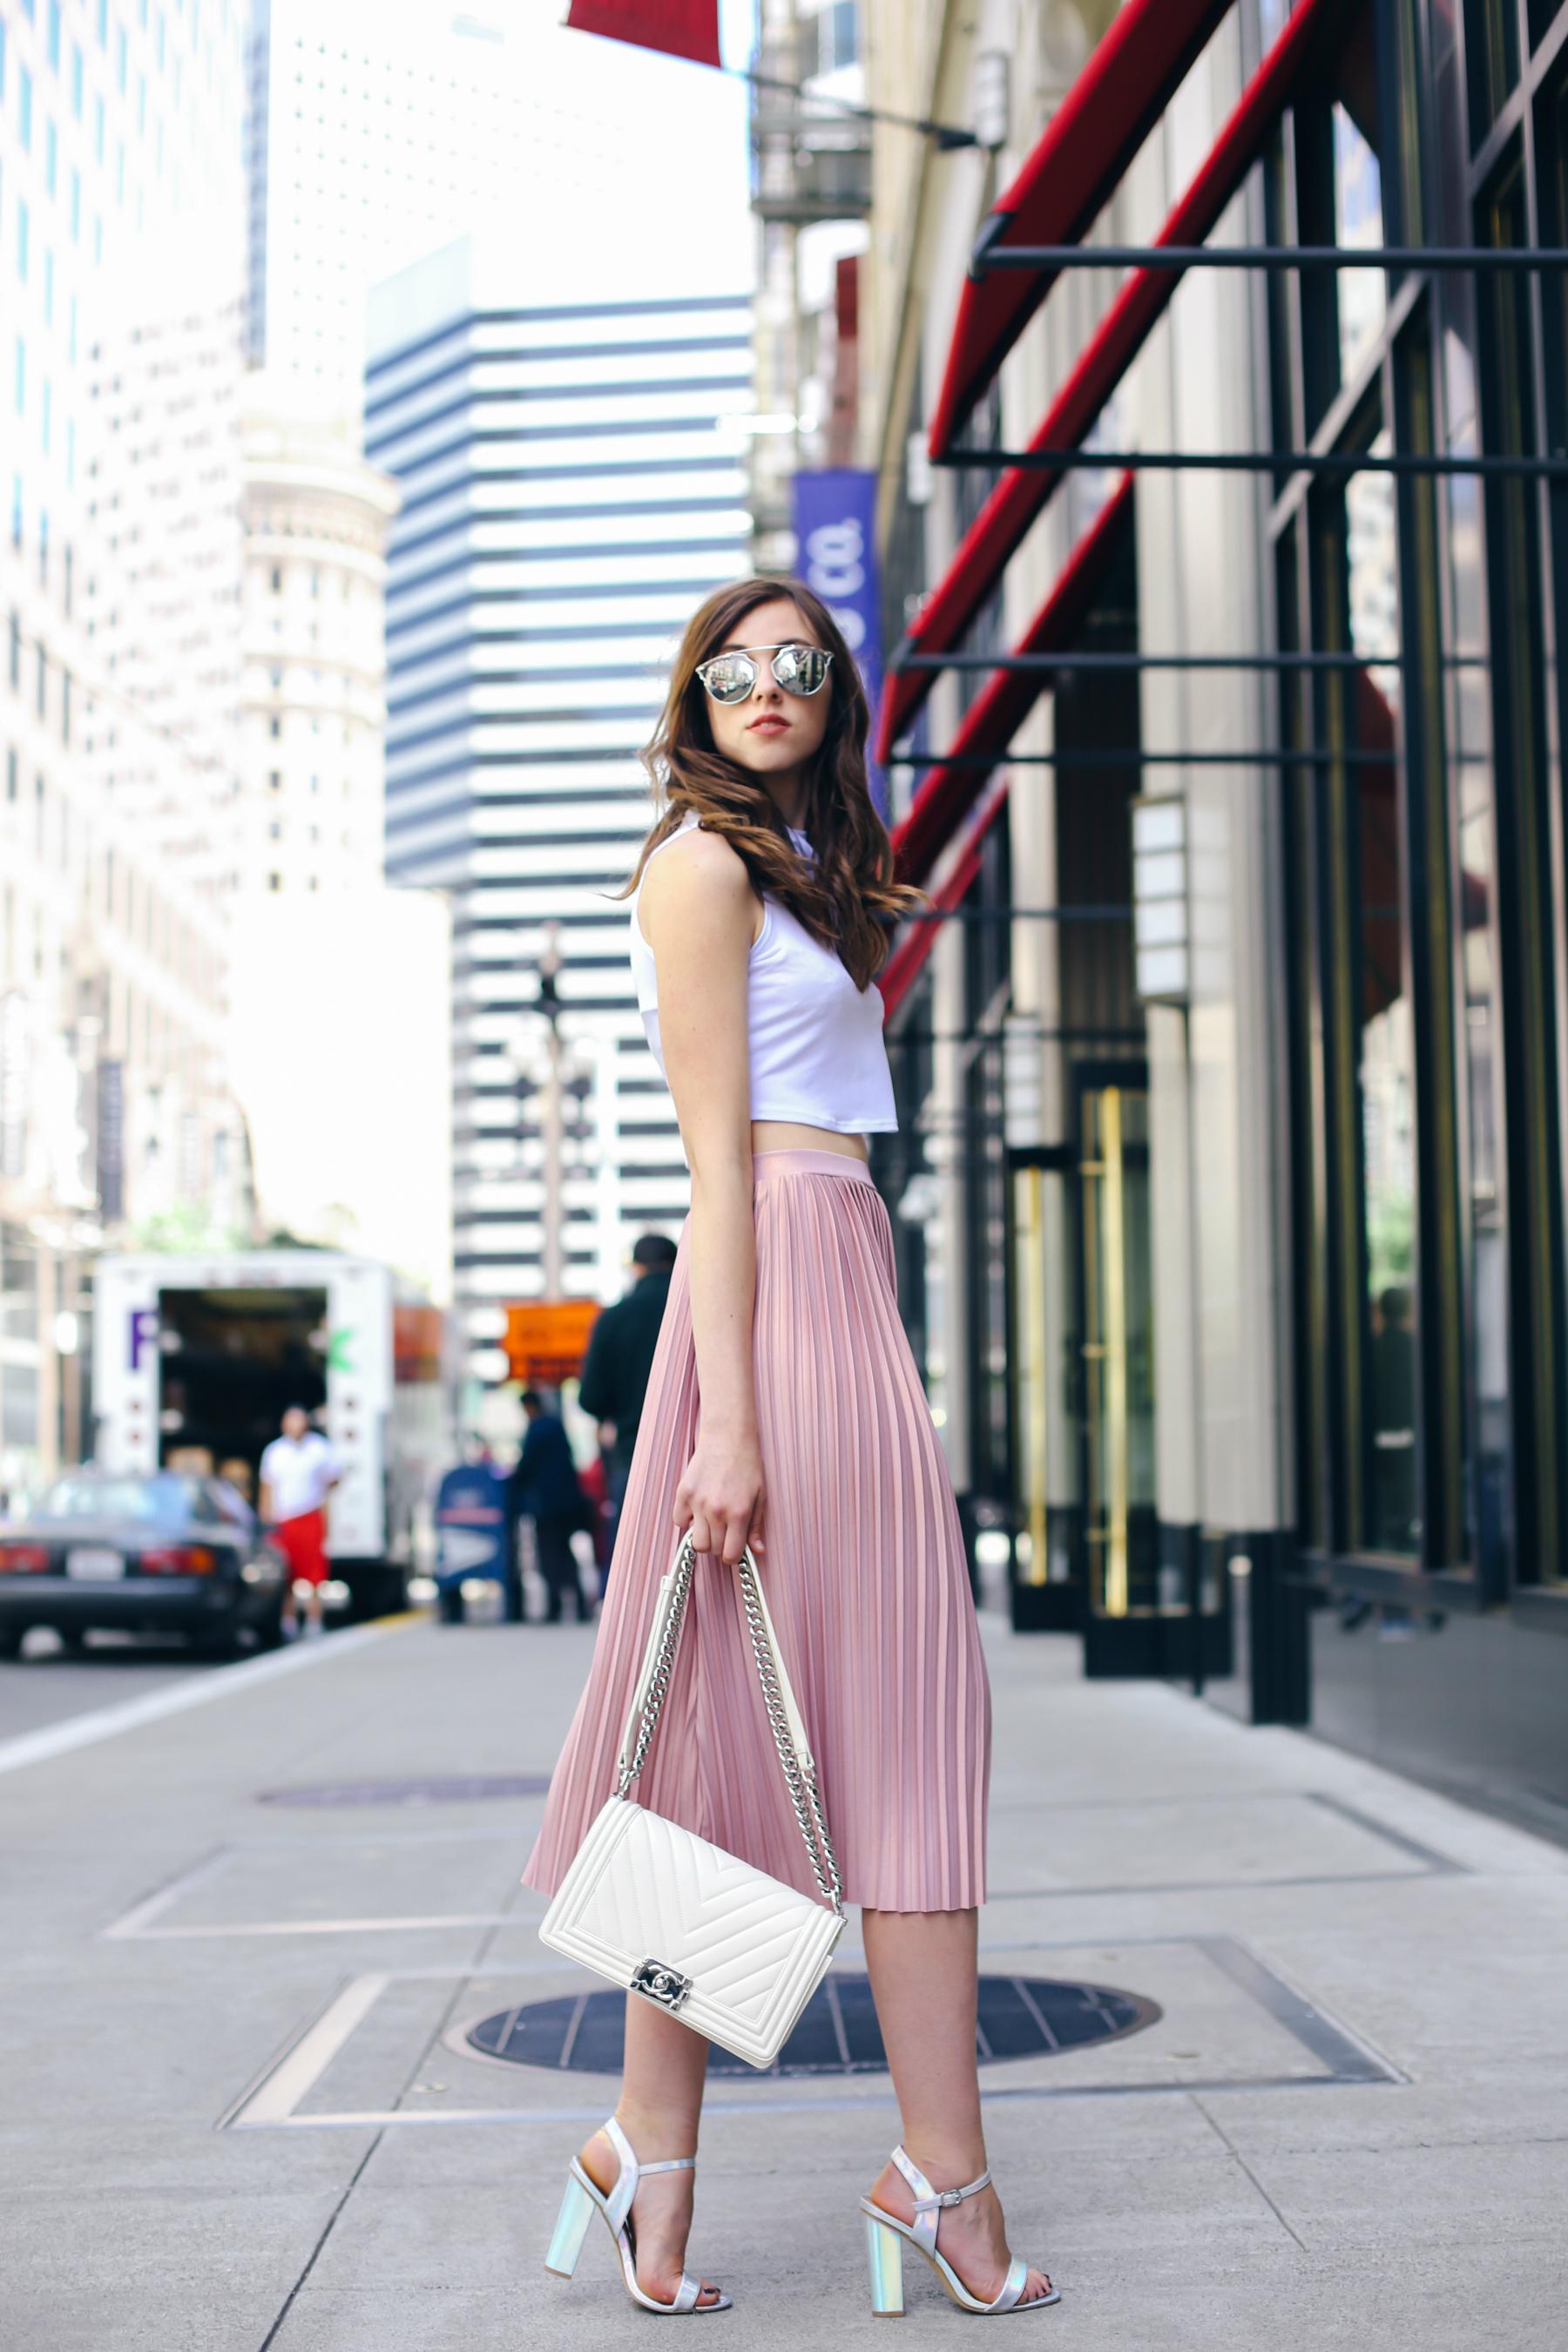 Barbora-Ondracova-FashioninmySoul-Fashion-Blogger-Photography-RyanbyRyanChua-7479